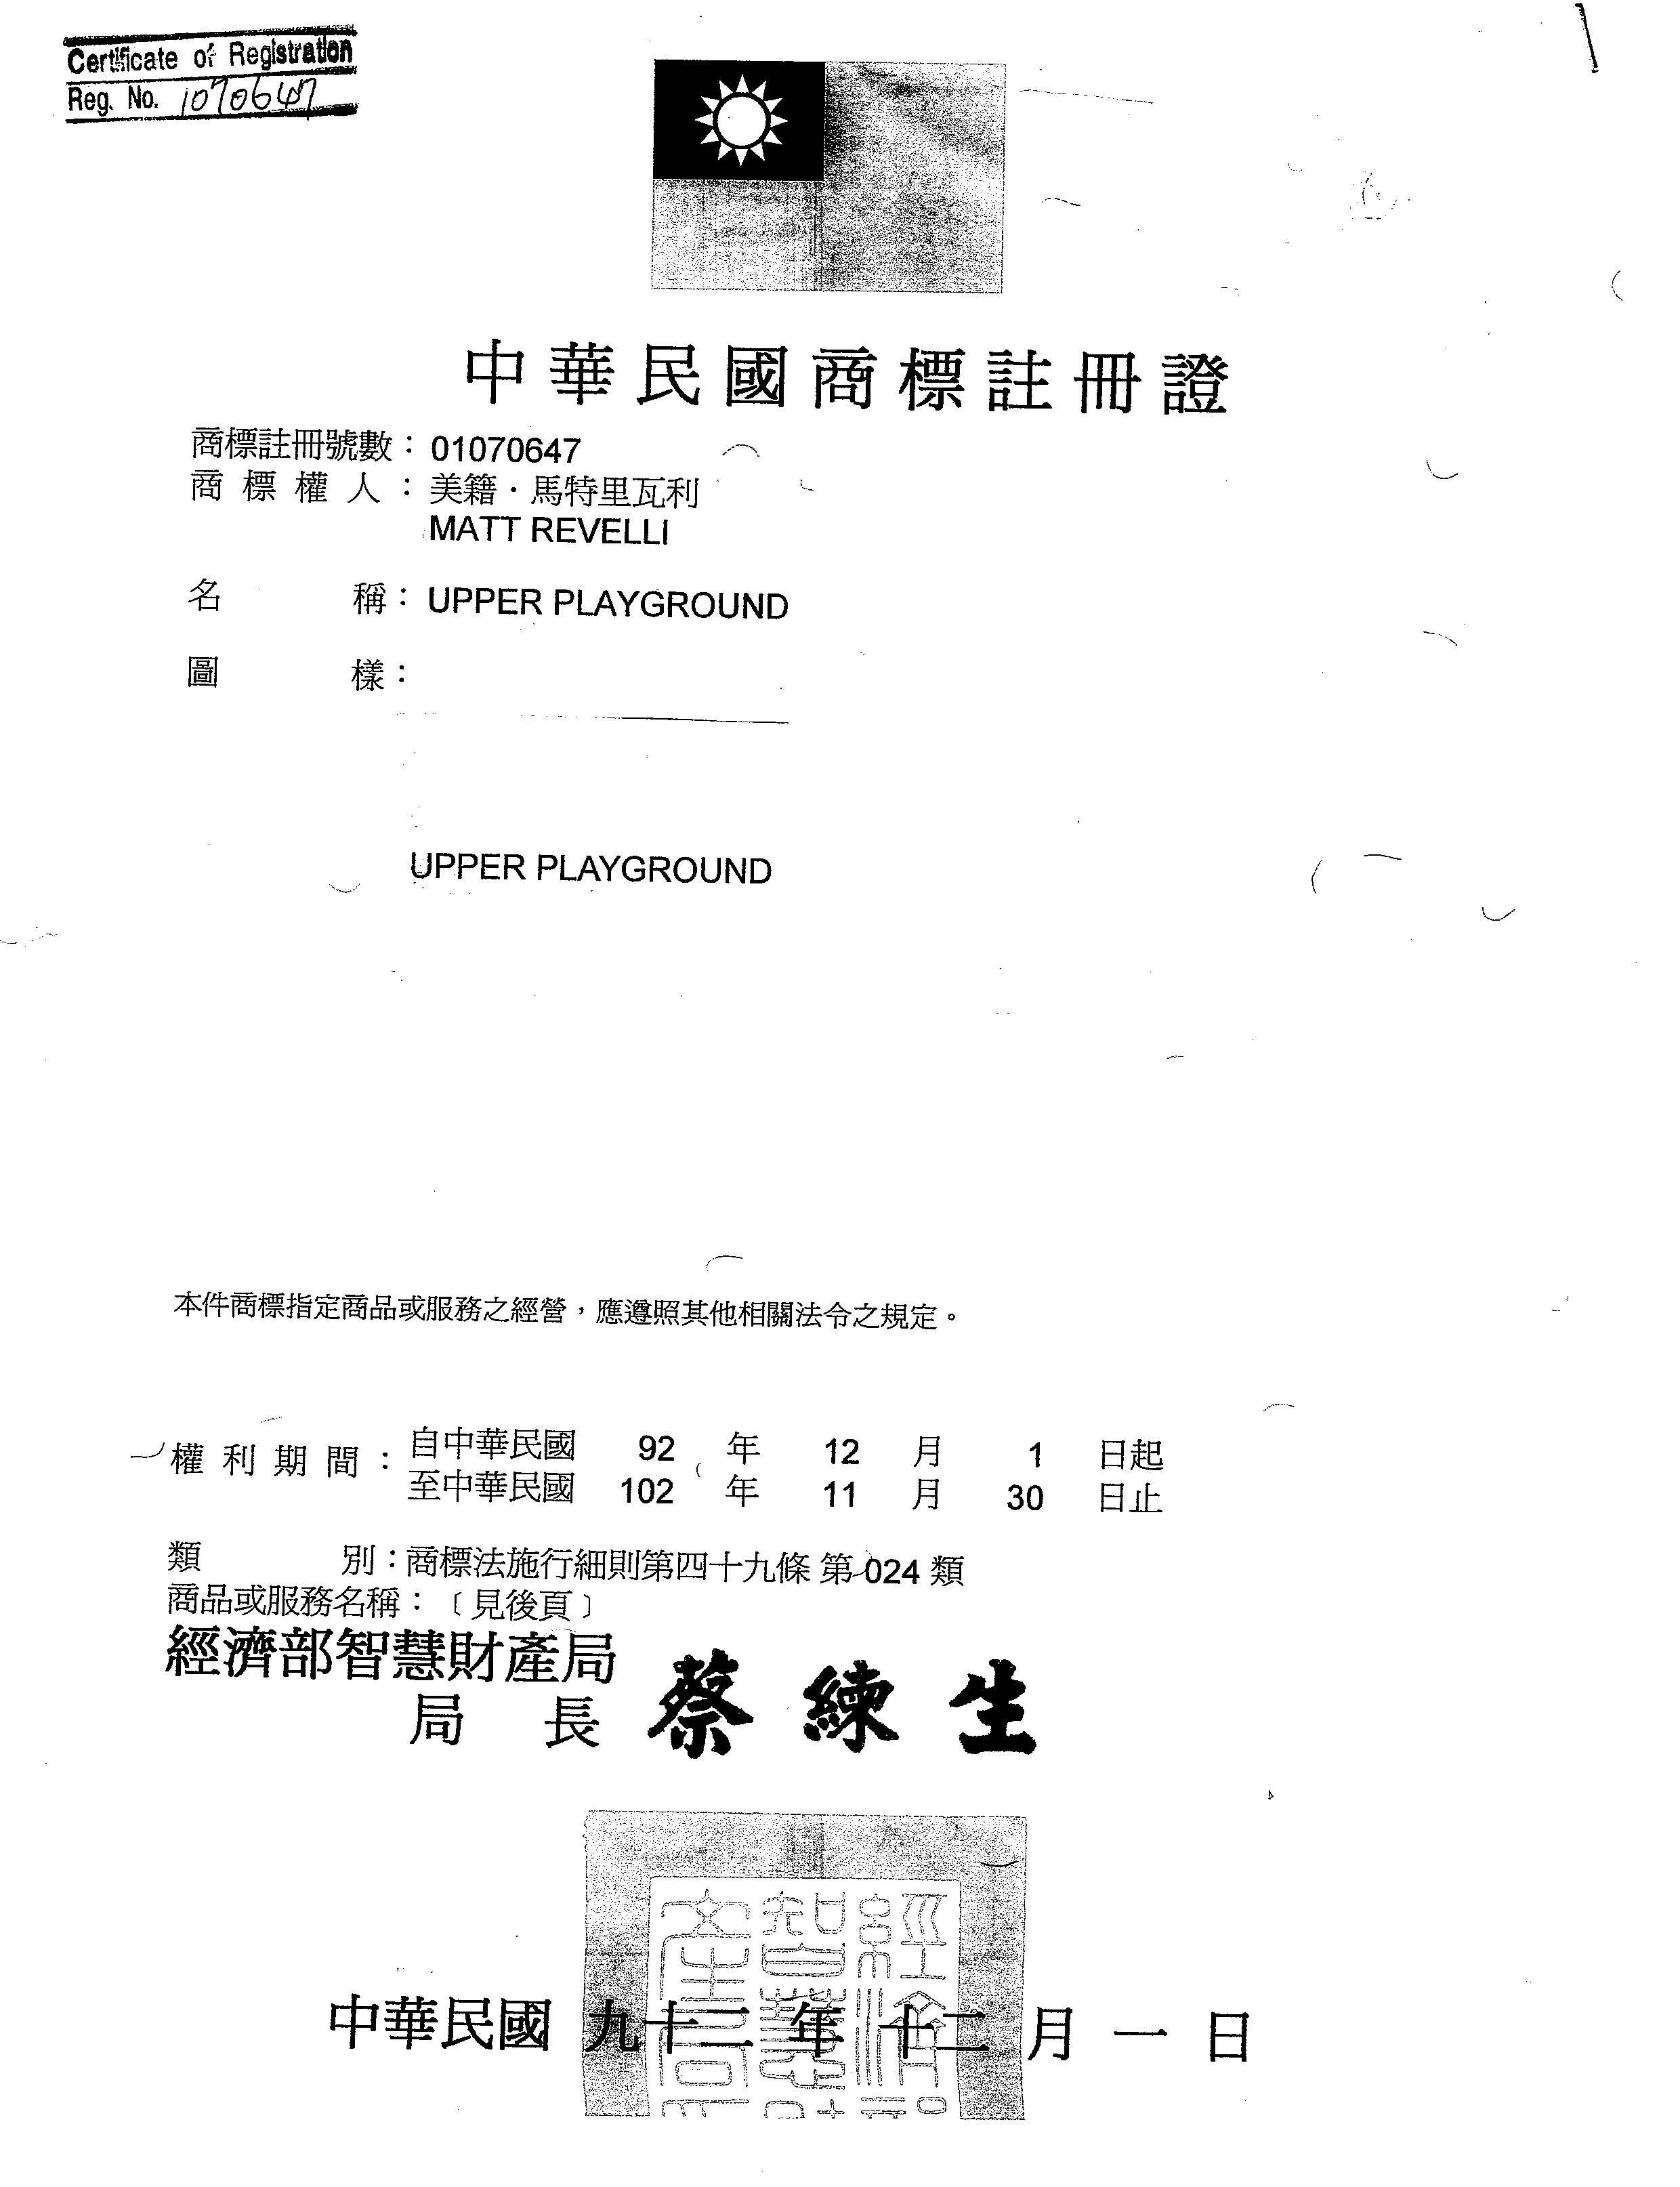 Taiwan Trademark Registration For Upper Playground